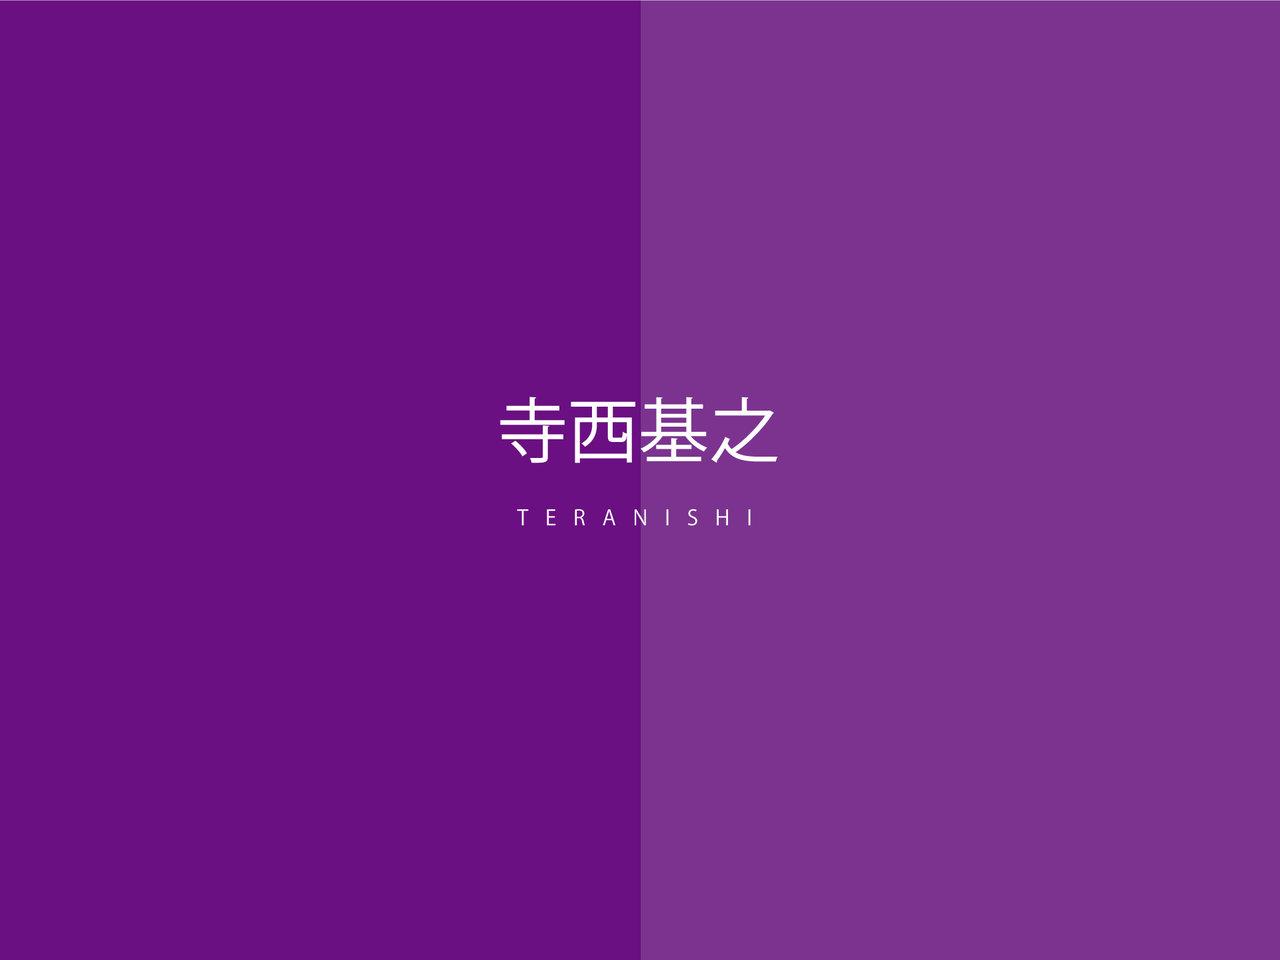 藤田真央、恐るべし 2019年12月7日東京文化会館